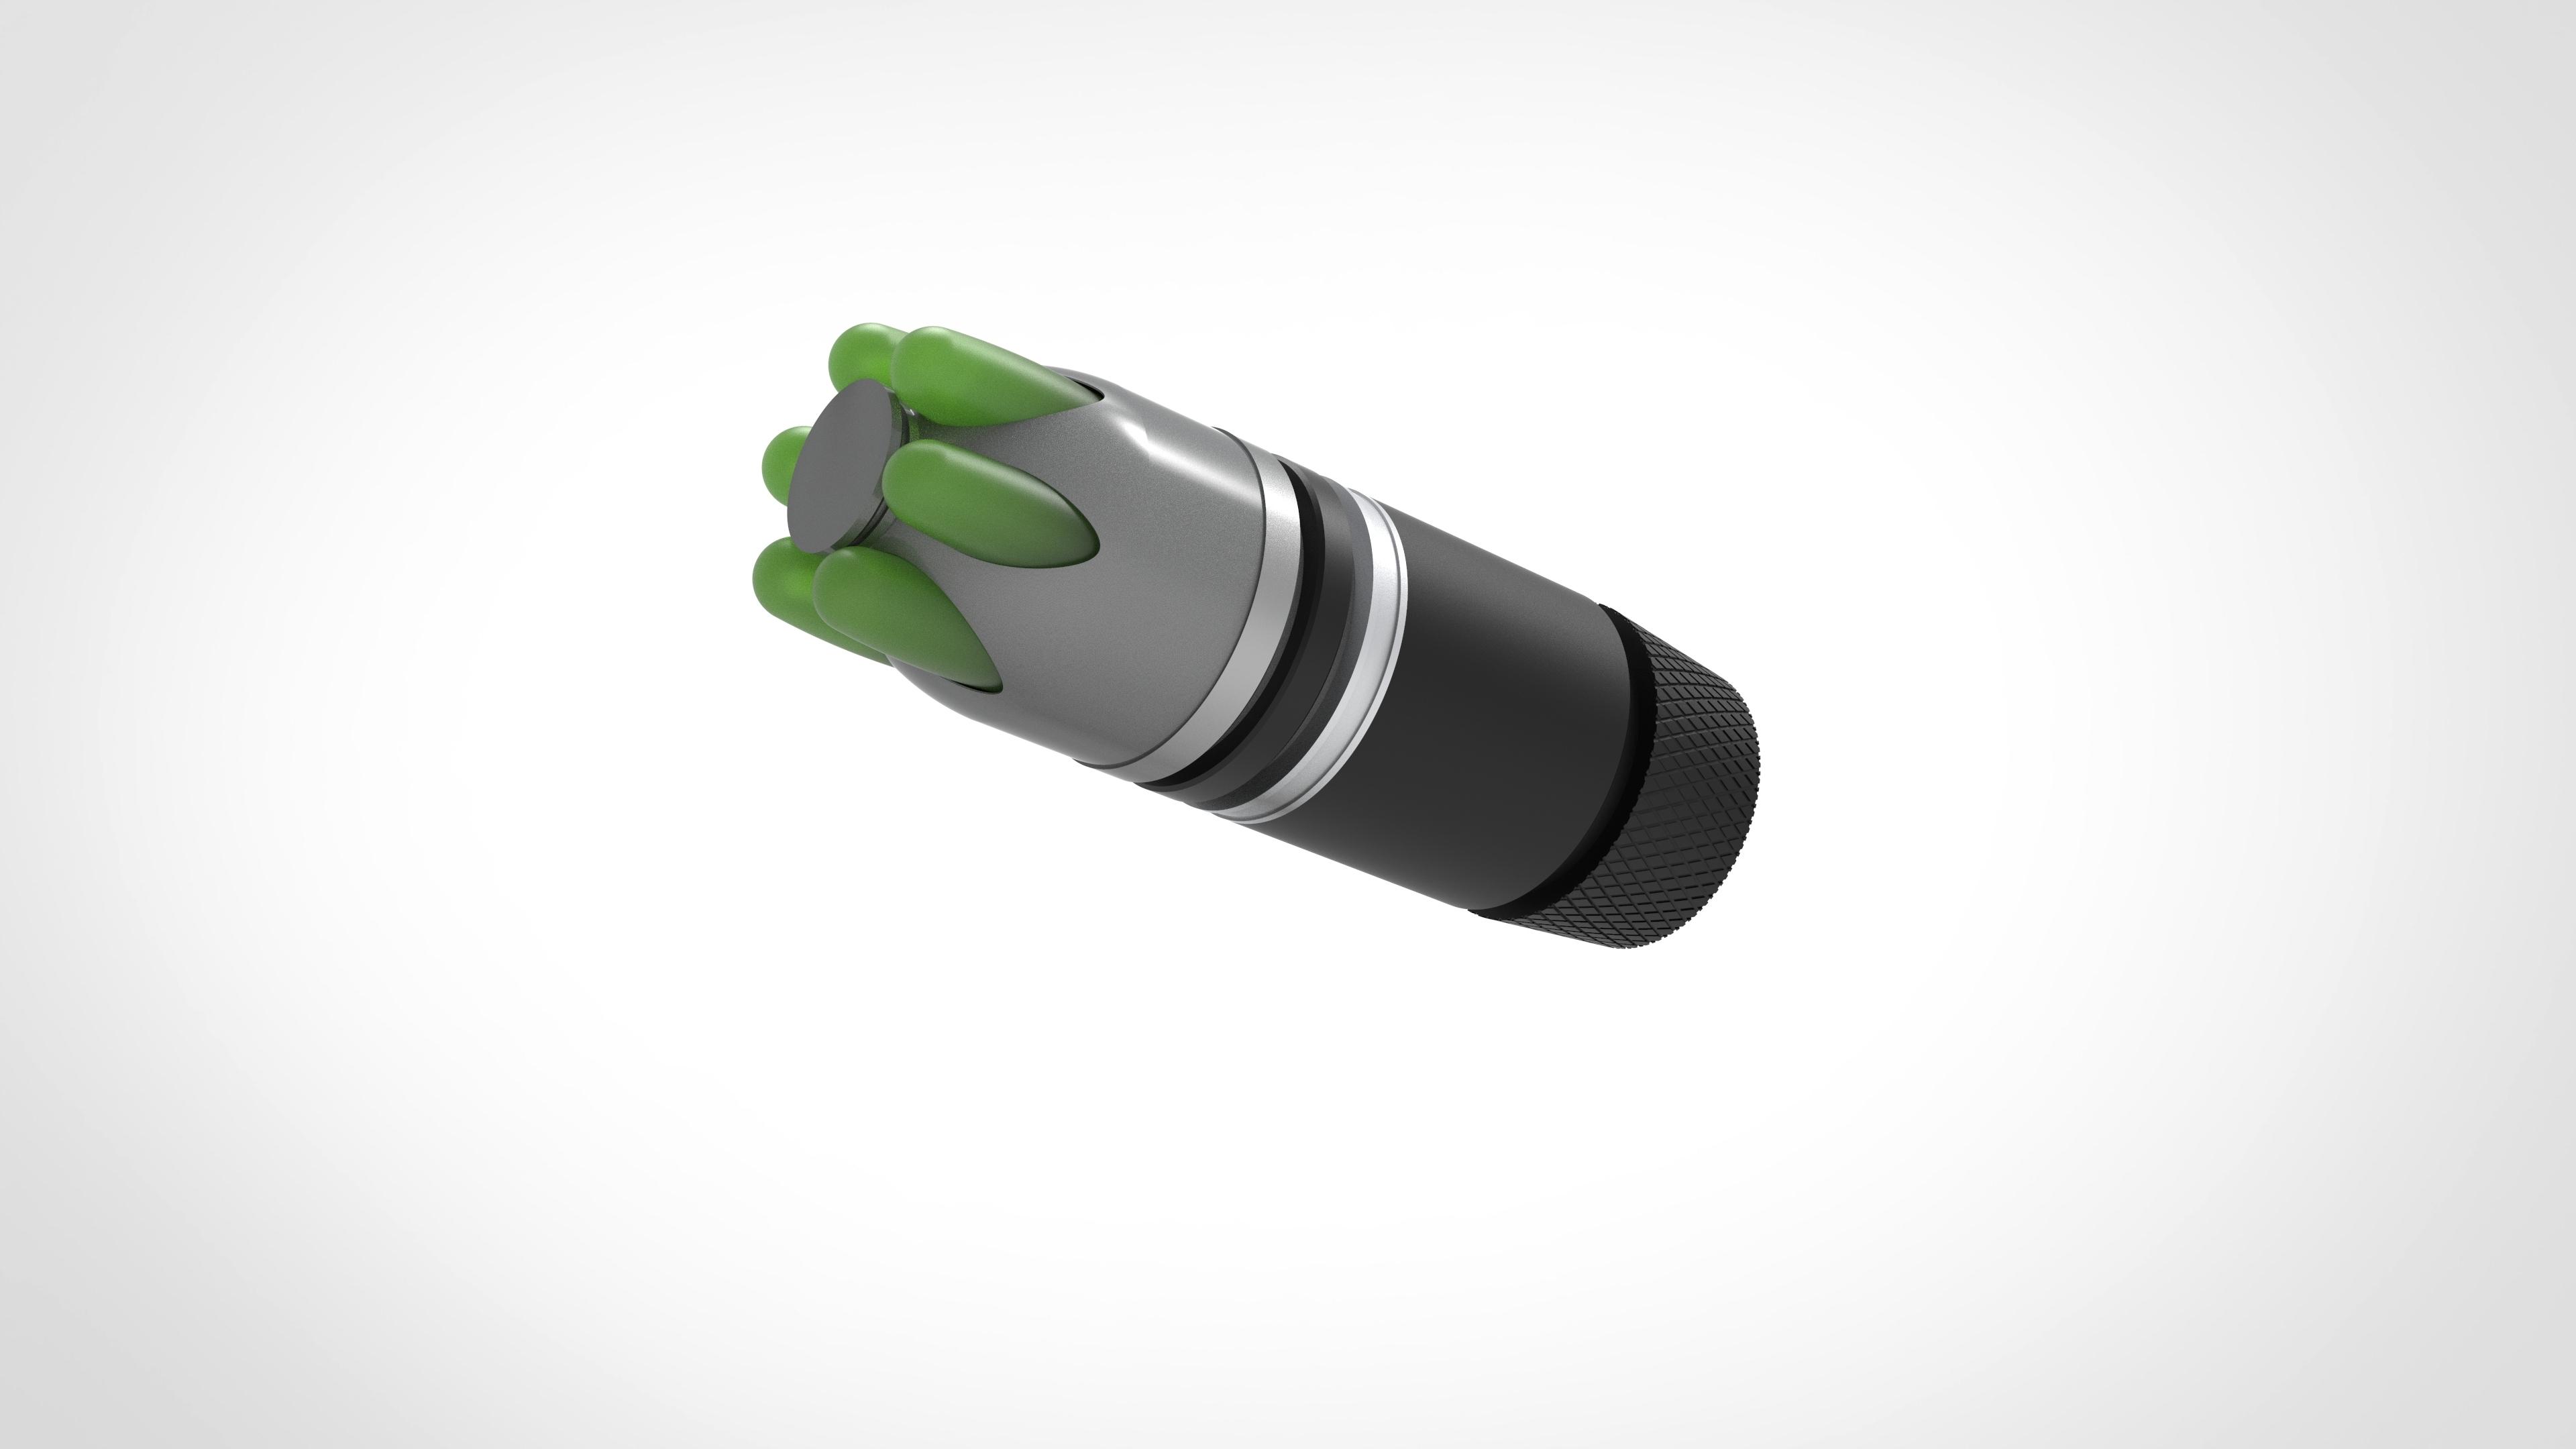 004.jpg Download 3MF file Glue grenade from the video game Batman: Arkham Origins • 3D printer model, vetrock